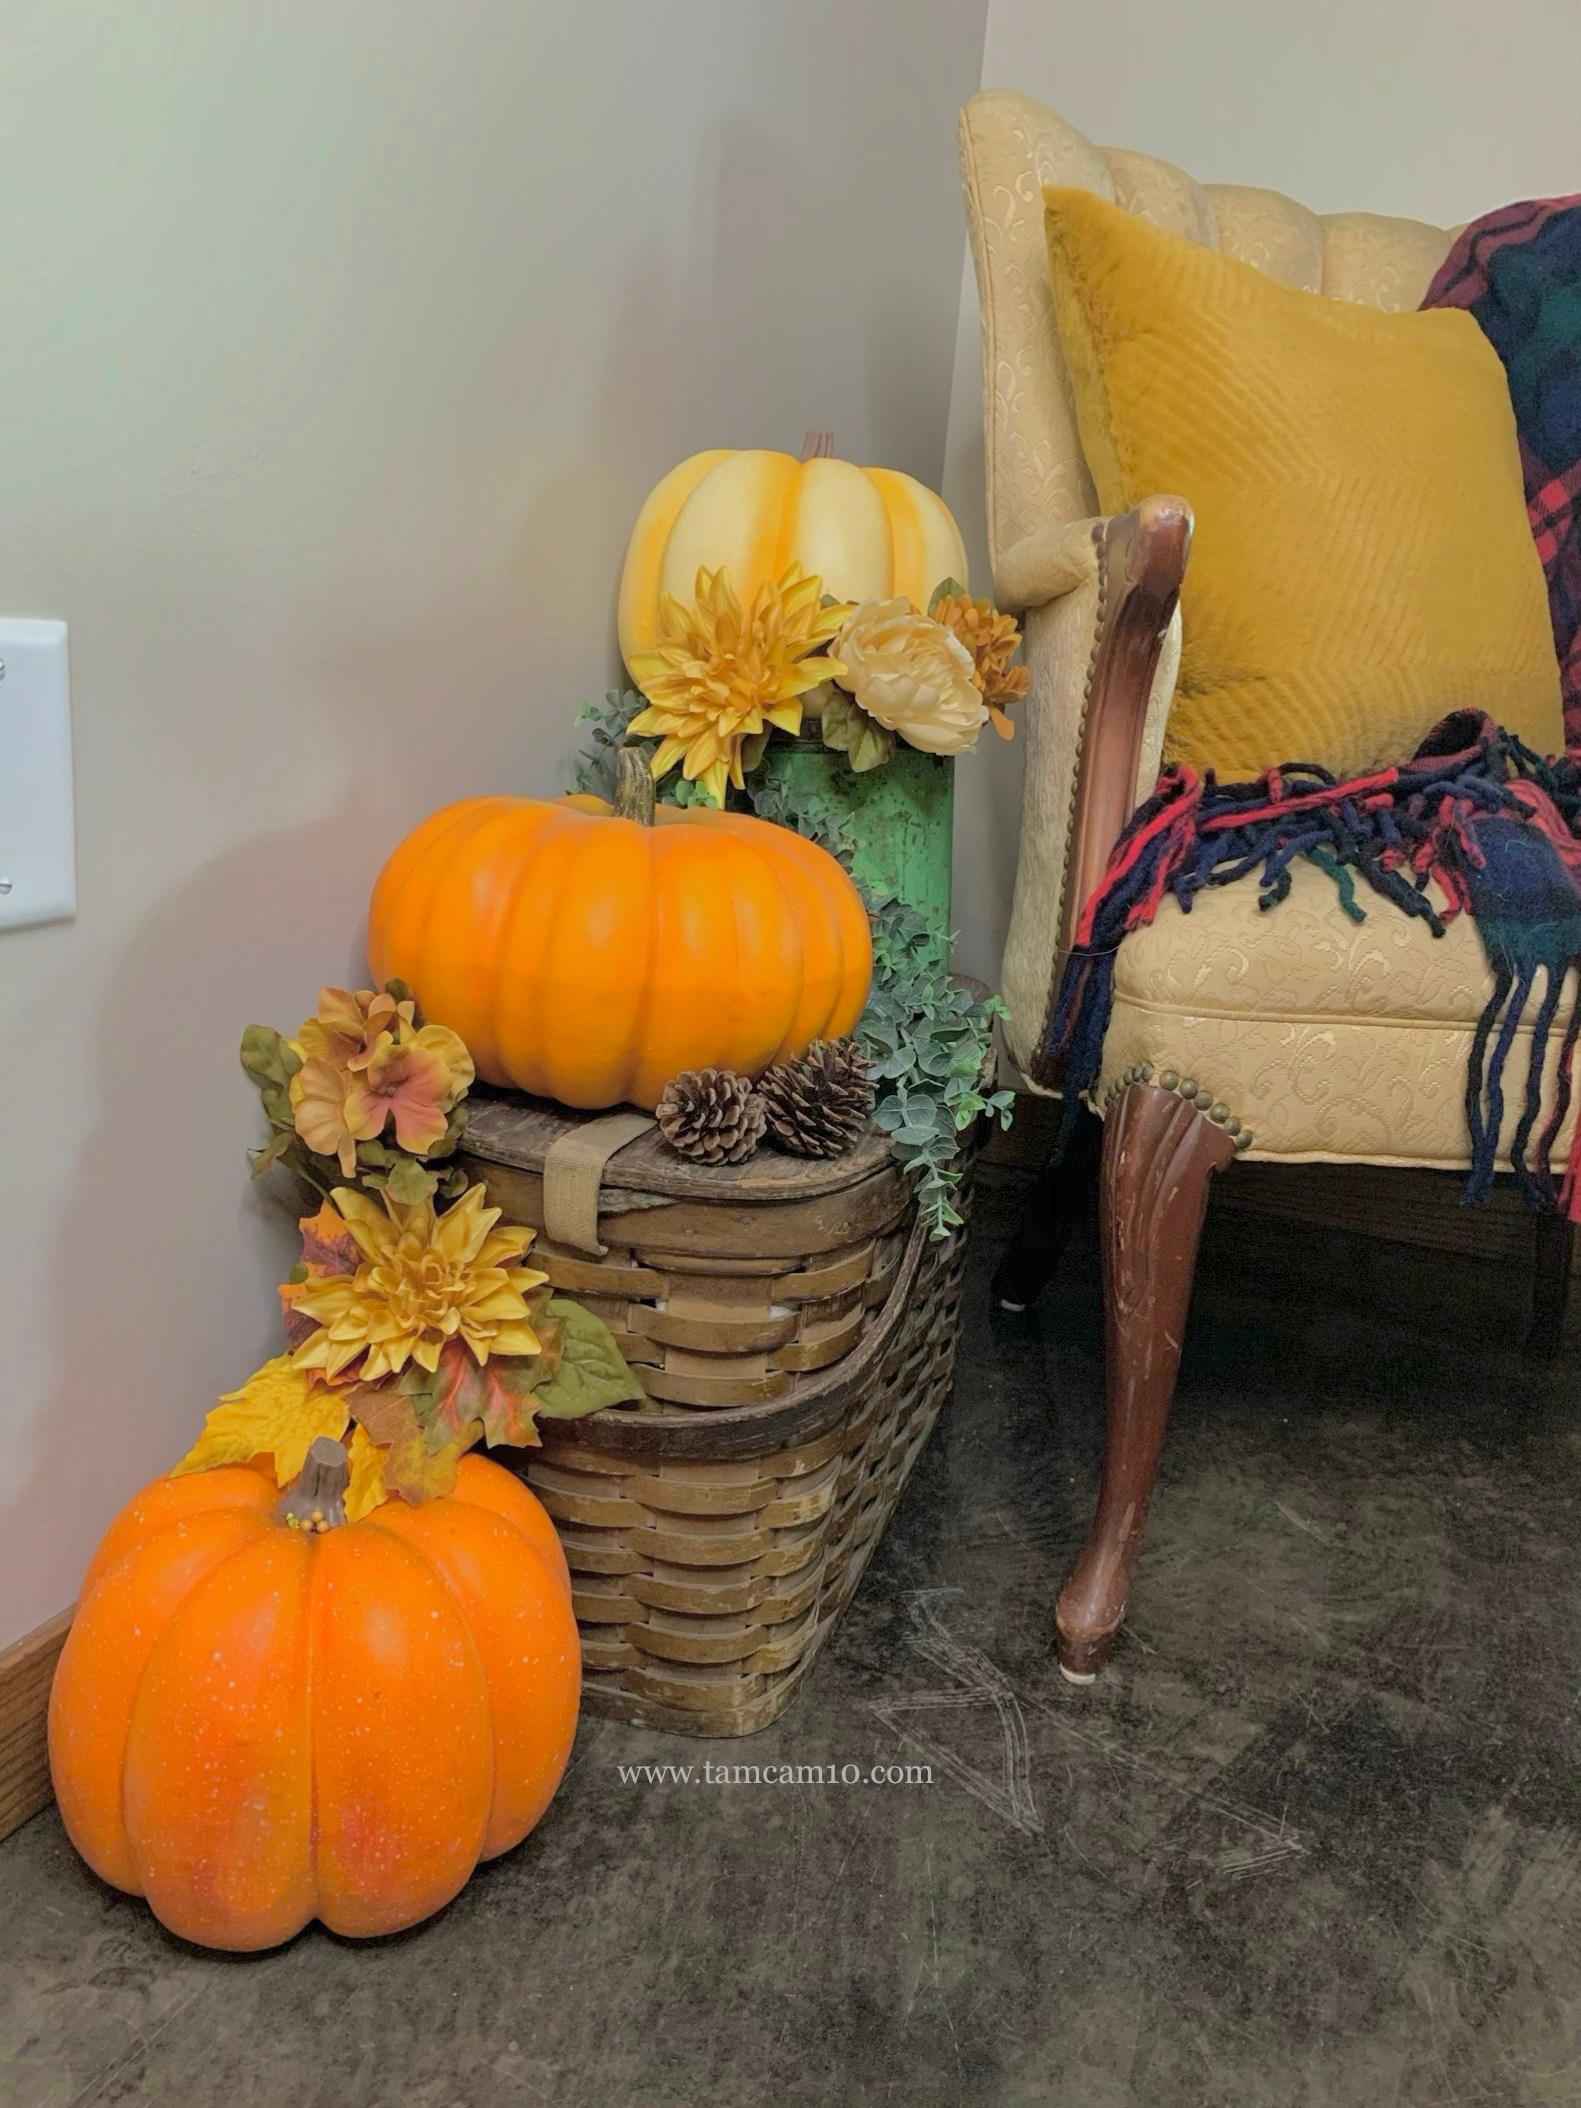 Falls Decor Ideas | Pumpkins | Vintage Picnic Basket | tamcam10